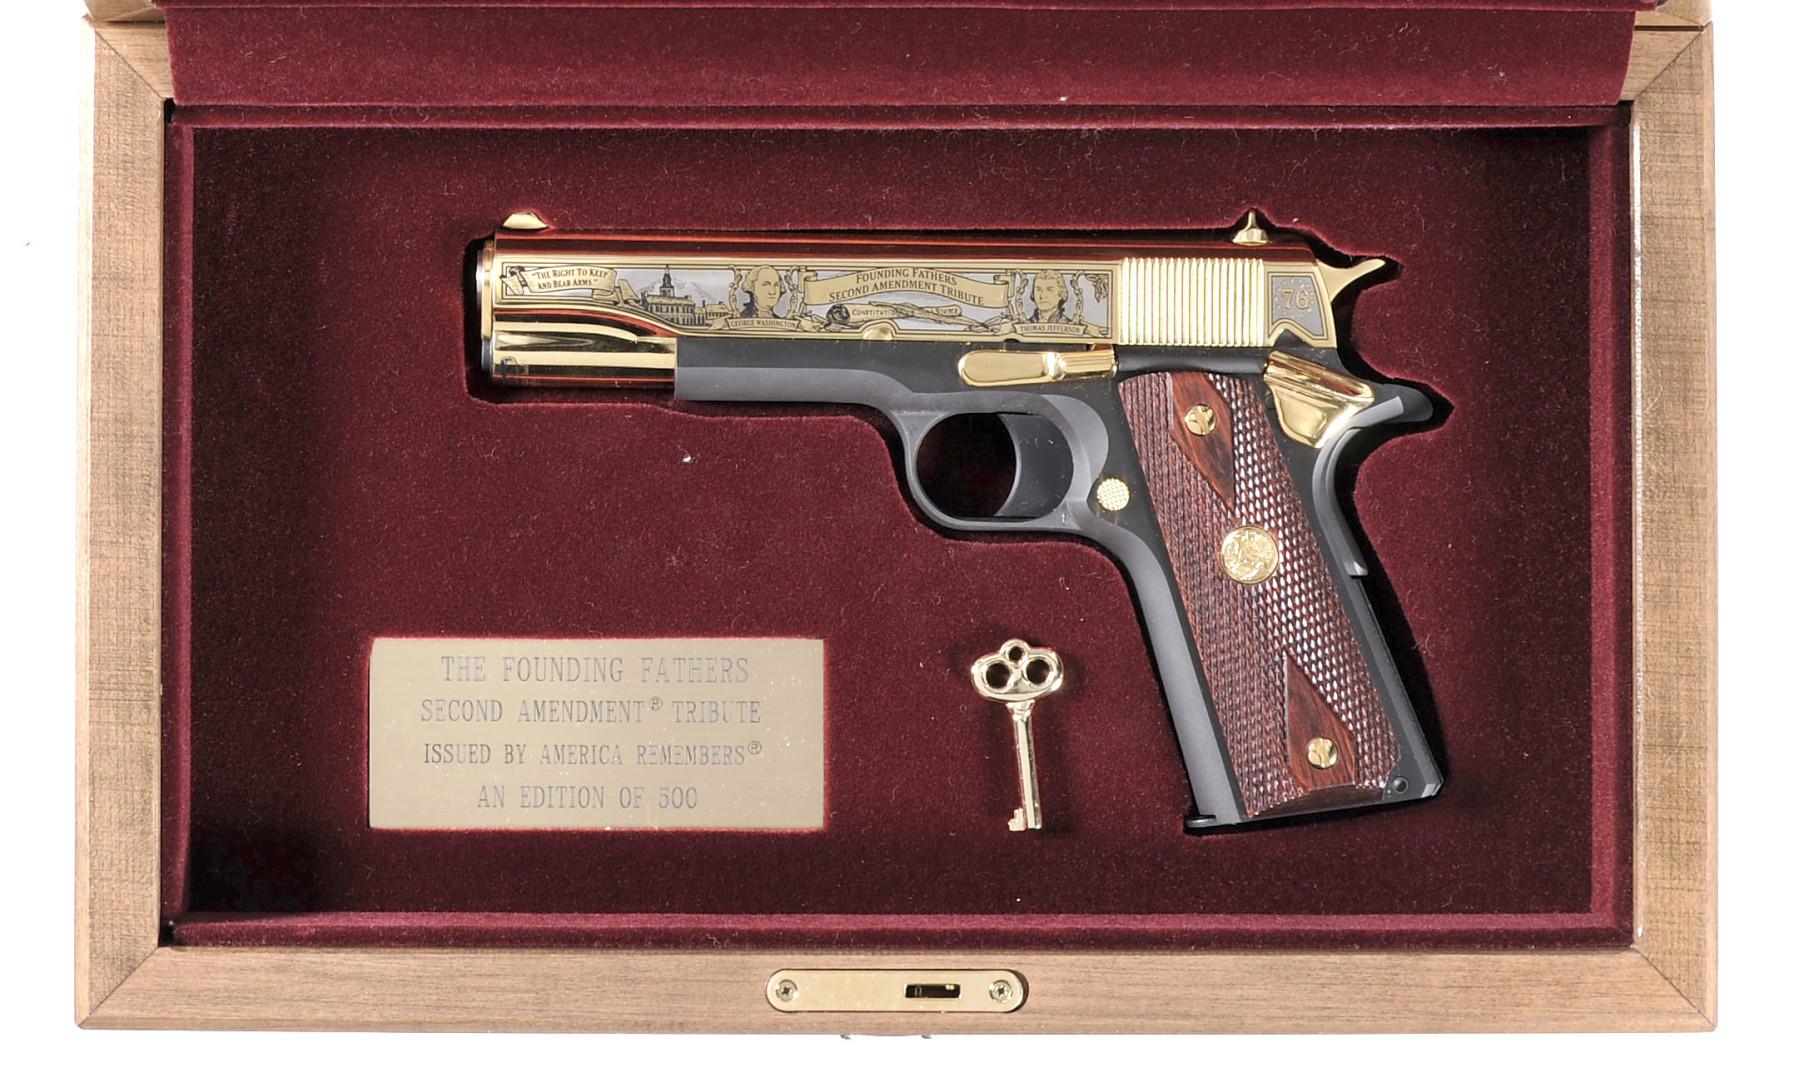 "Colt 1911 ""Founding Fathers Second Amendment Tribute"" pistol"